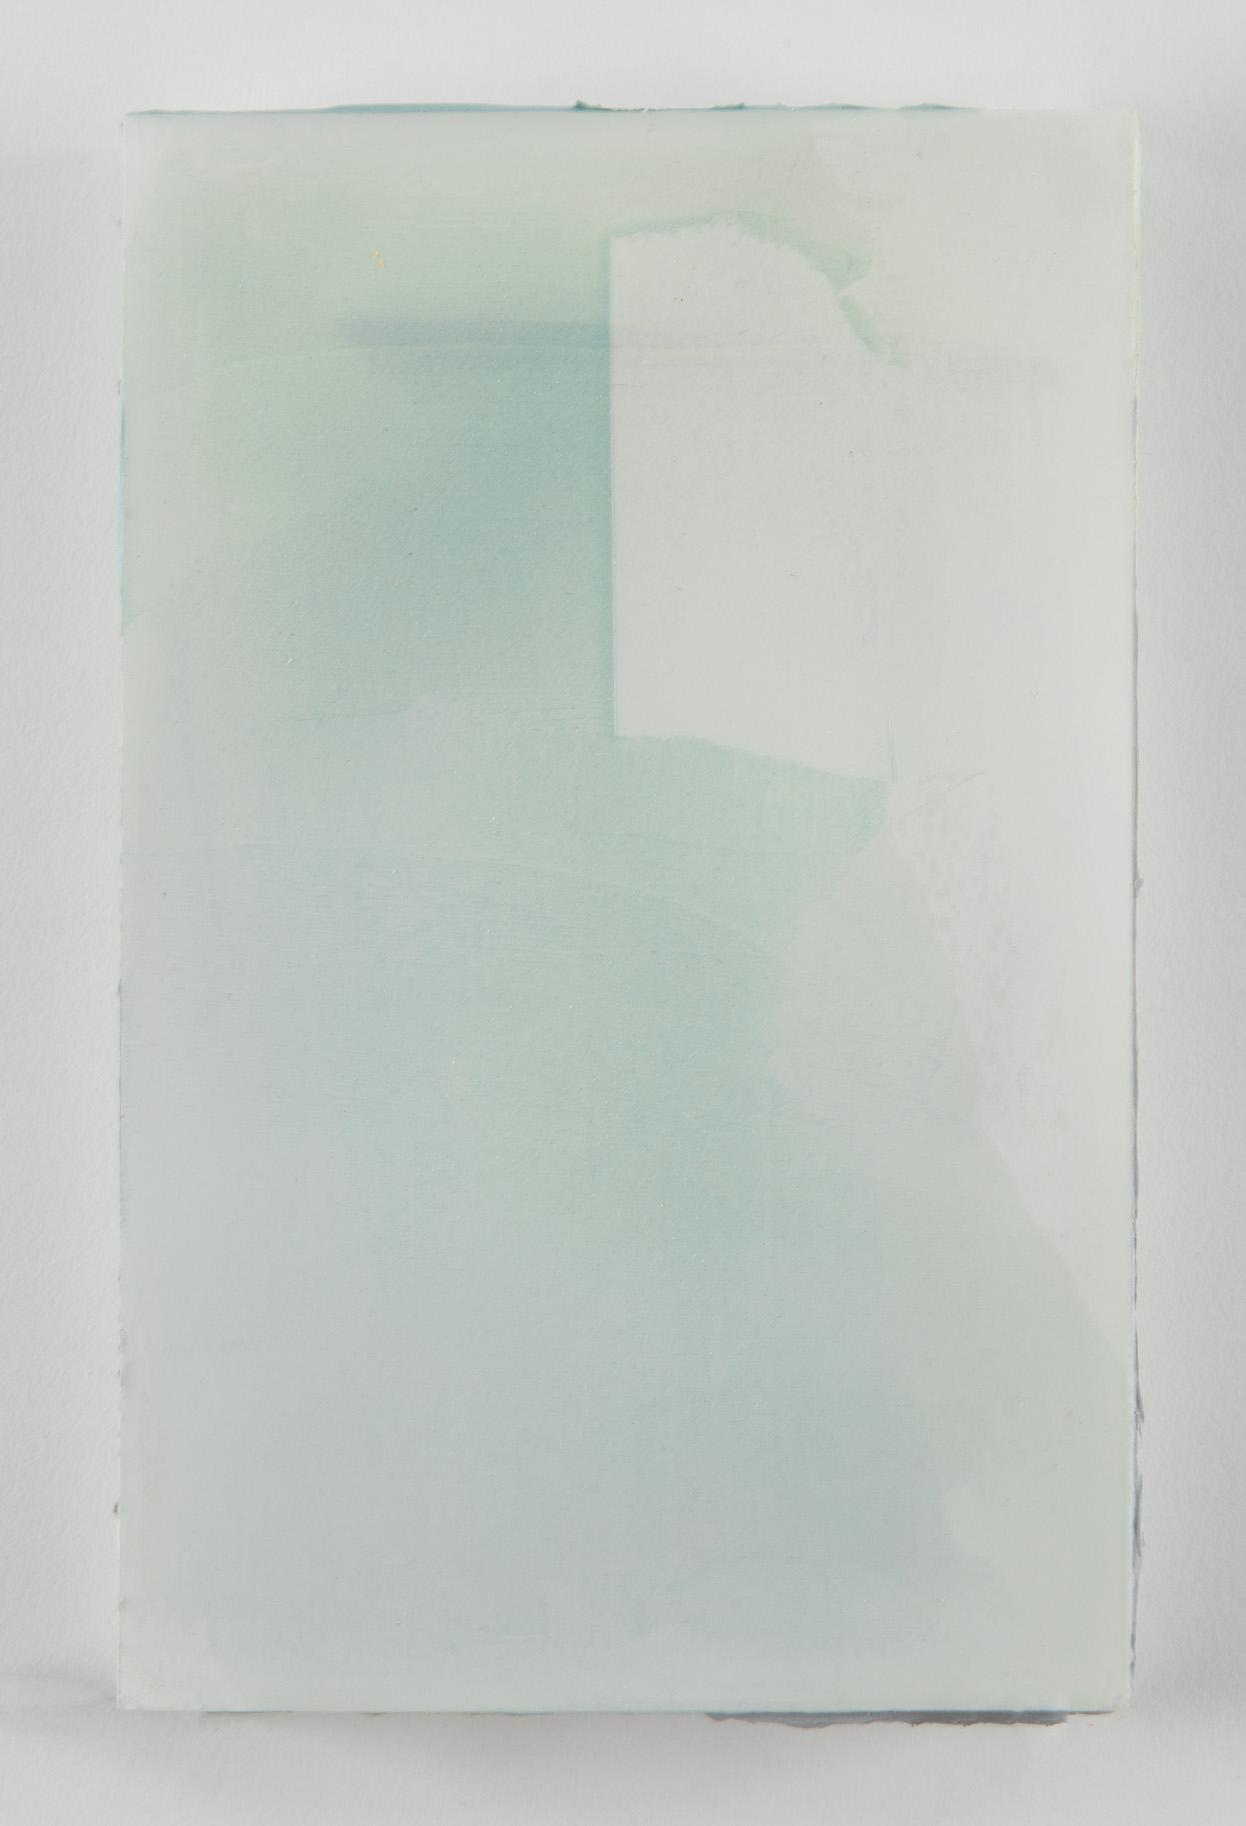 Lichen Memory 1, acrylic on plexiglass, 8.25 x 5.25. x.75 inches, 2016